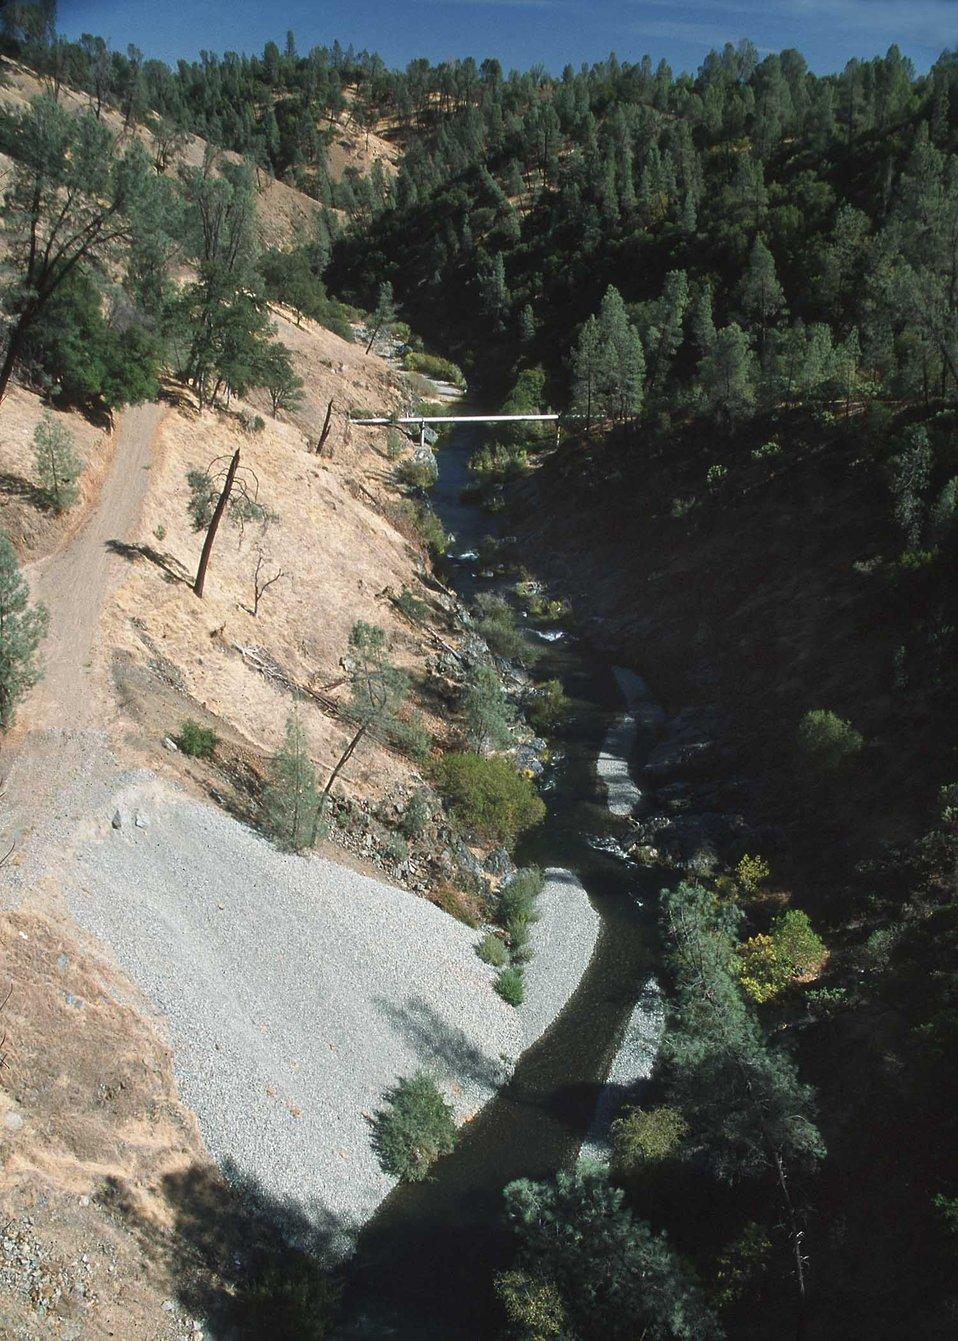 Far view of gravel injection site below bridge.